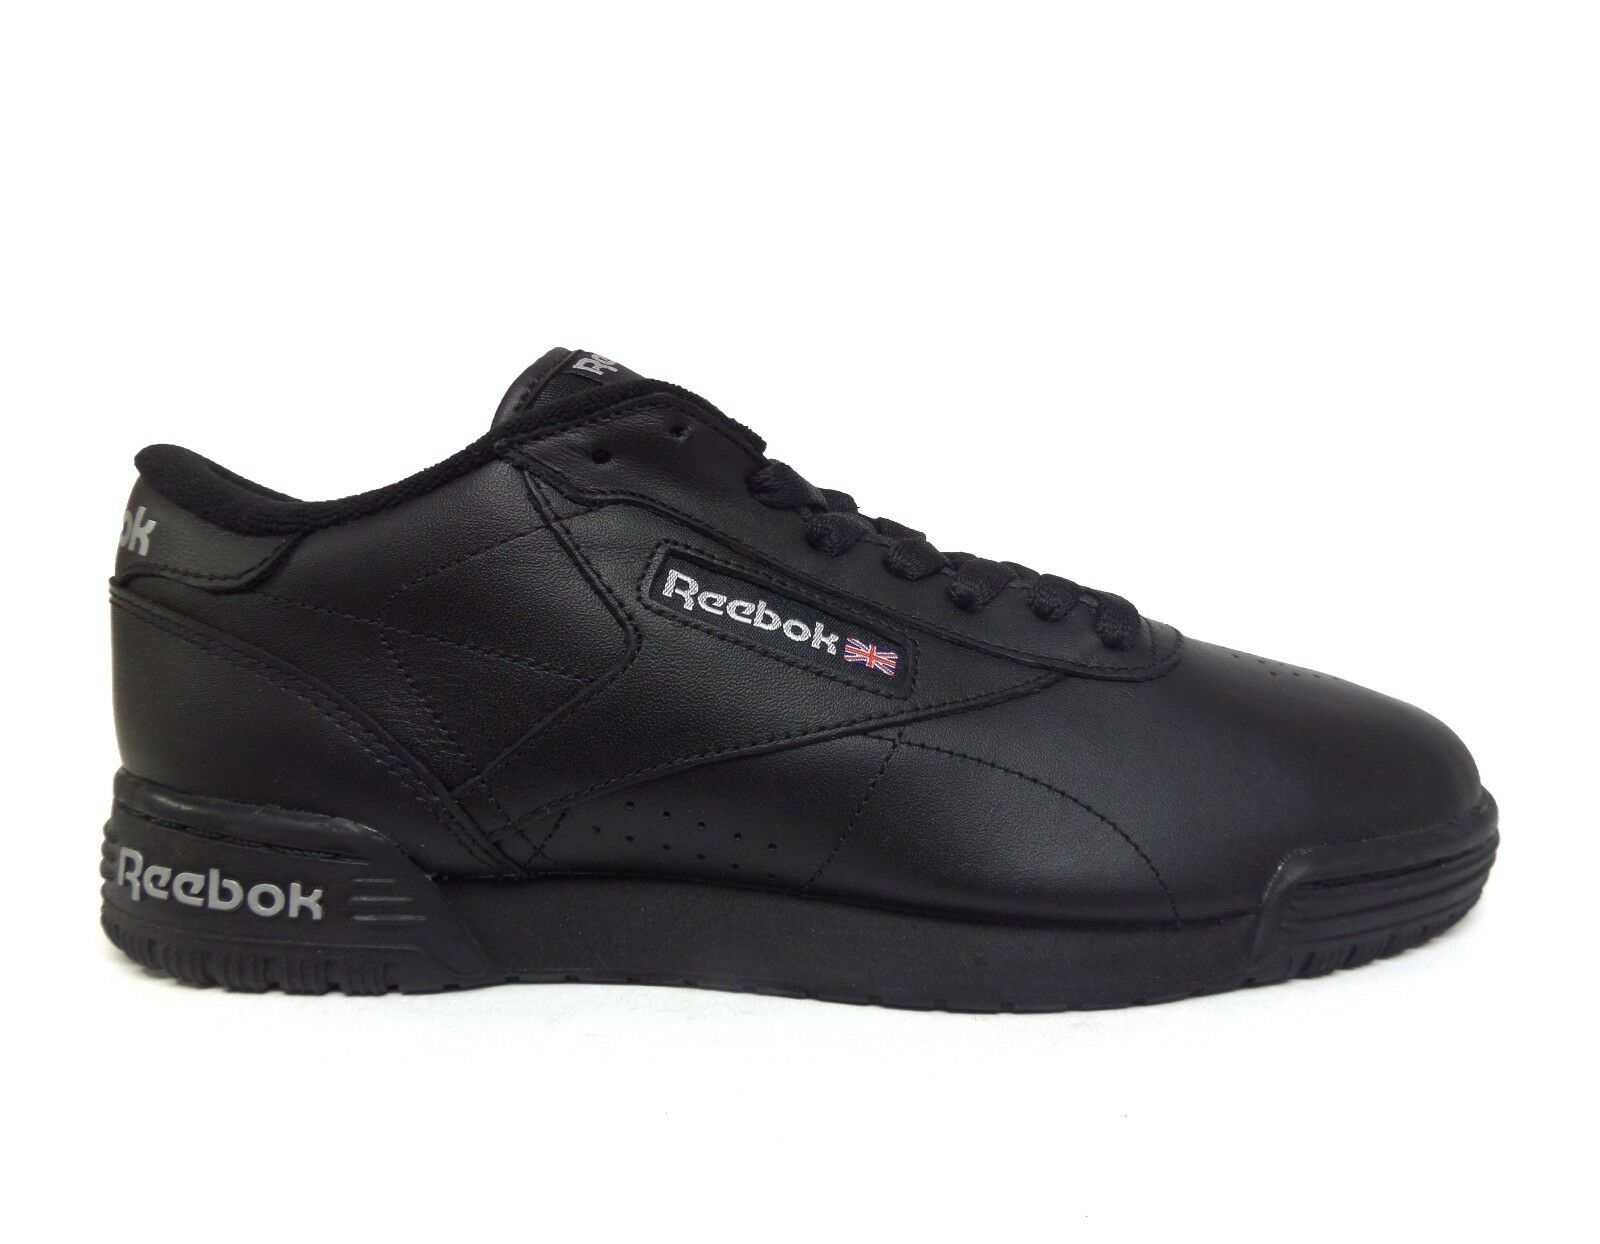 Reebok Men's EXOFIT LO CLEAN LOGO INT Shoes Black/Black AR3168 b